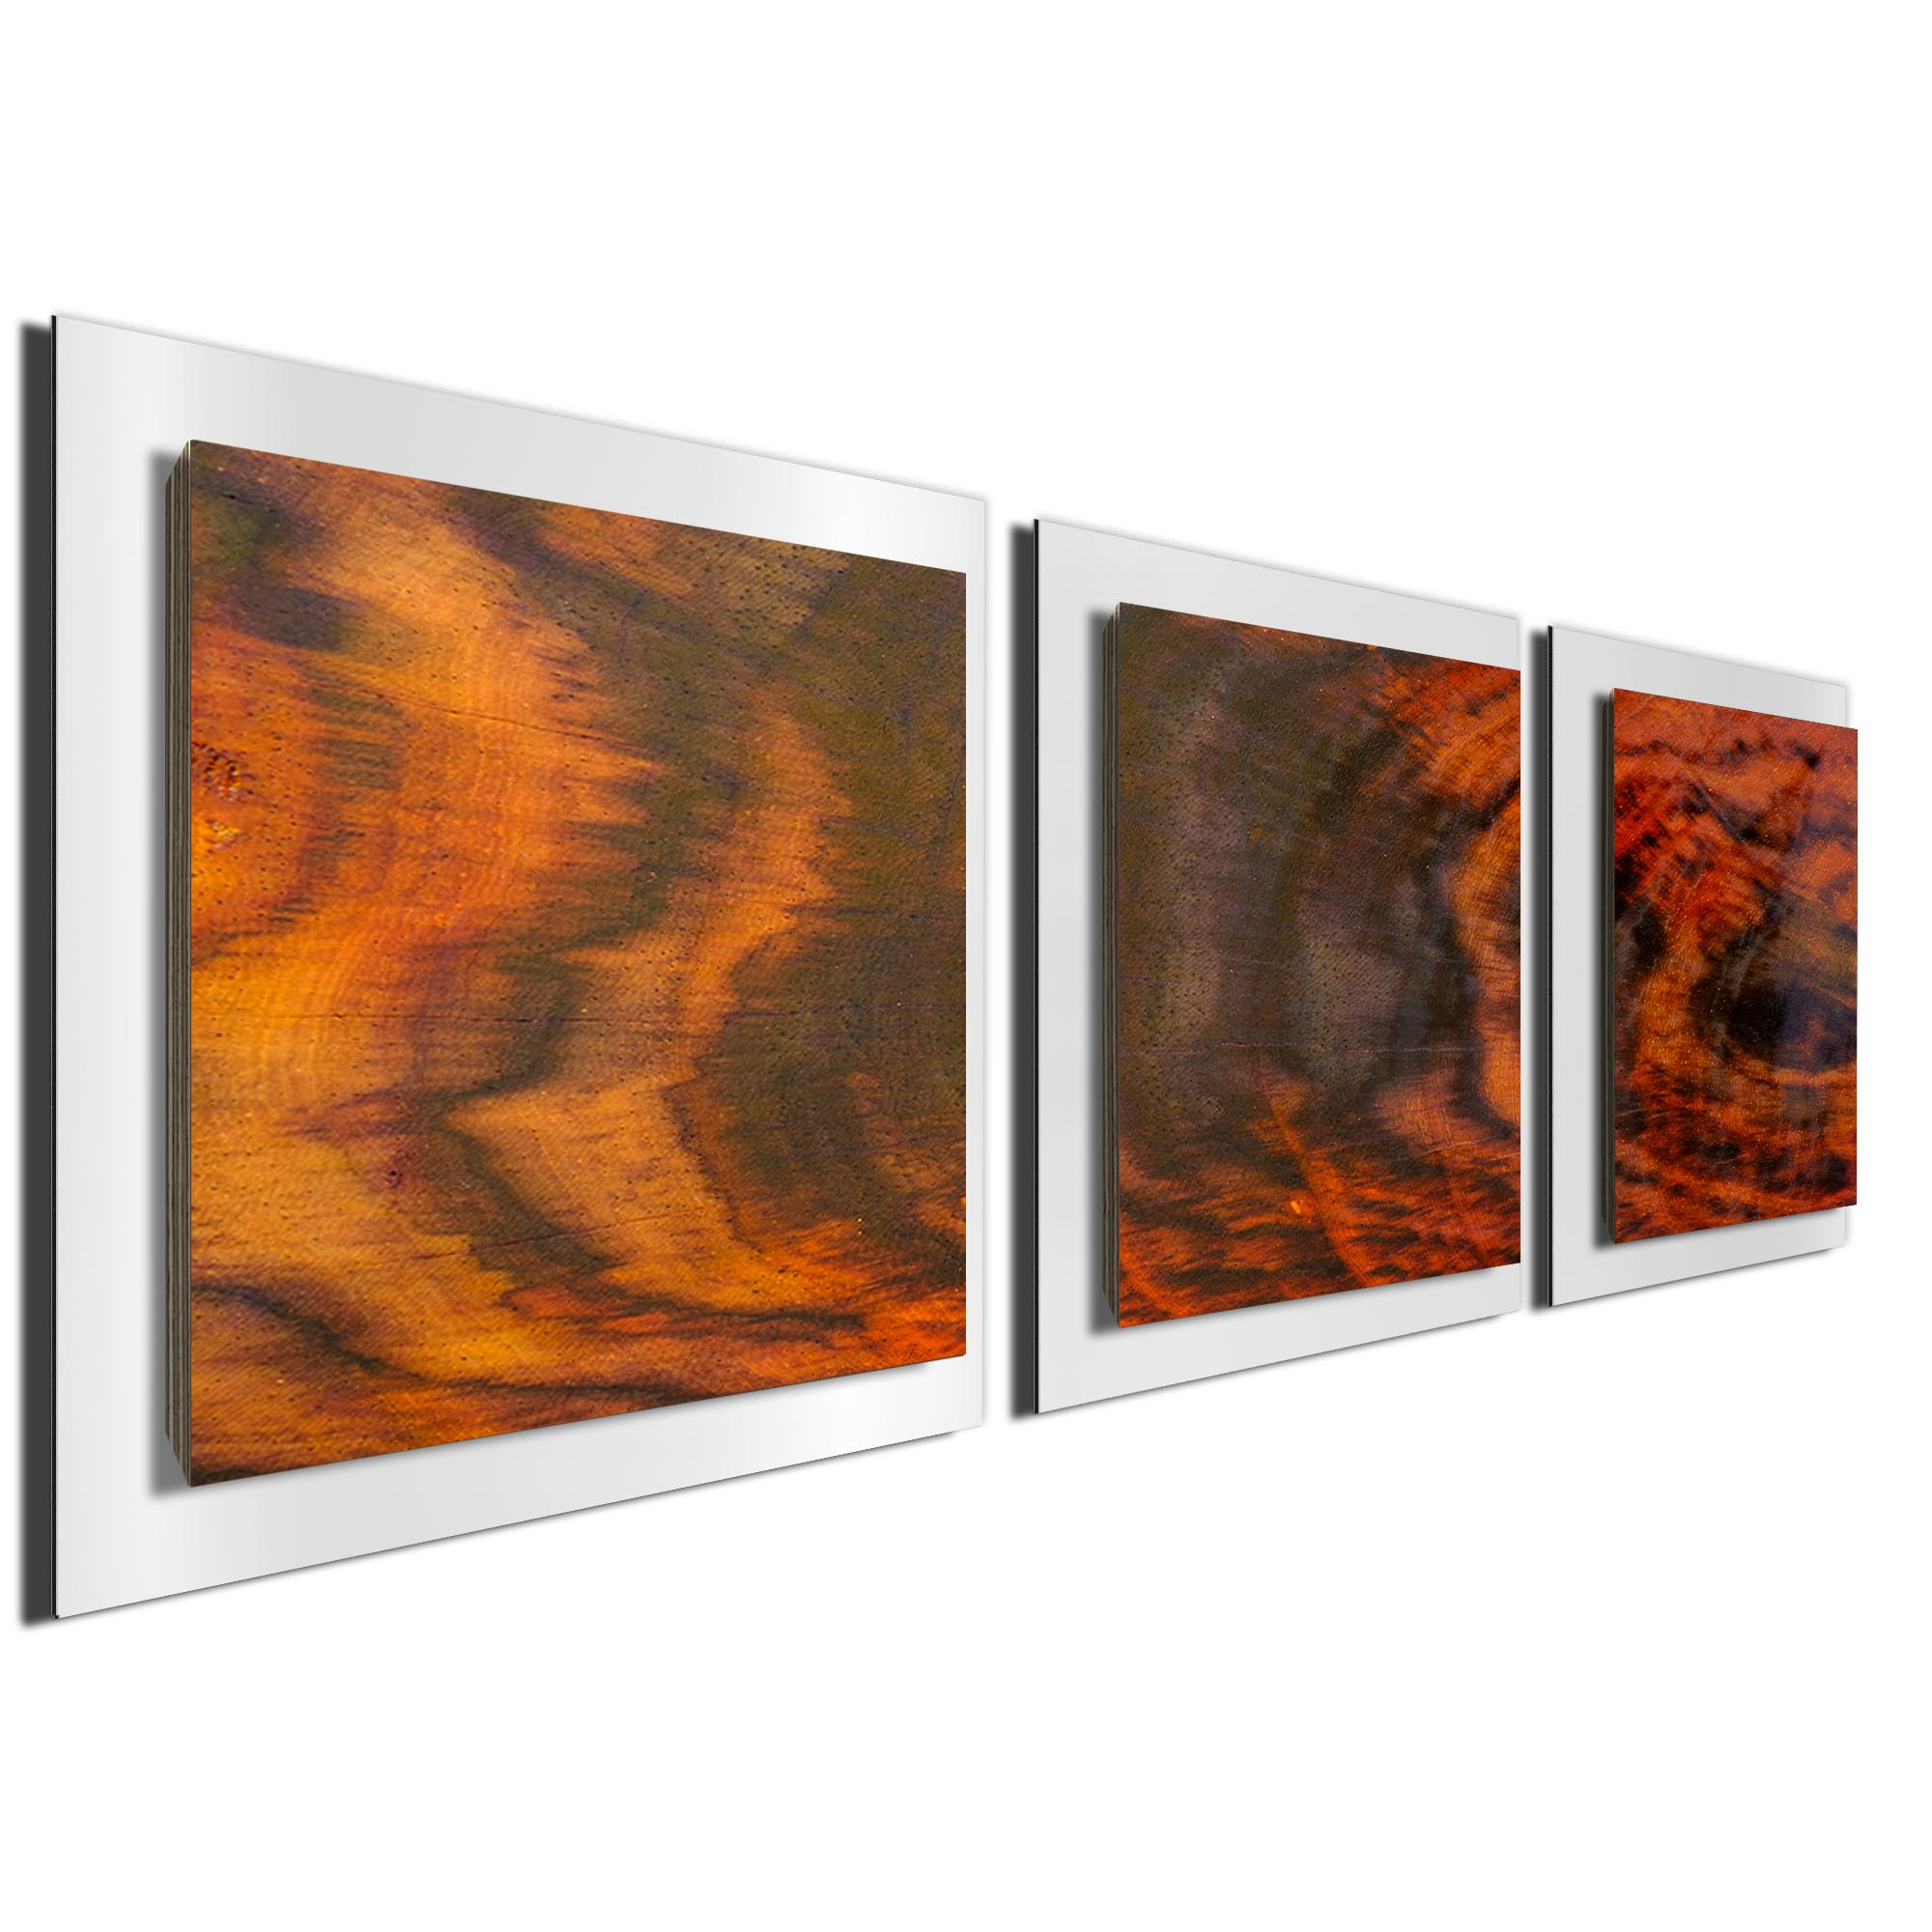 Burnt Wood Essence White by Adam Schwoeppe Rustic Modern Style Wood Wall Art - Image 2